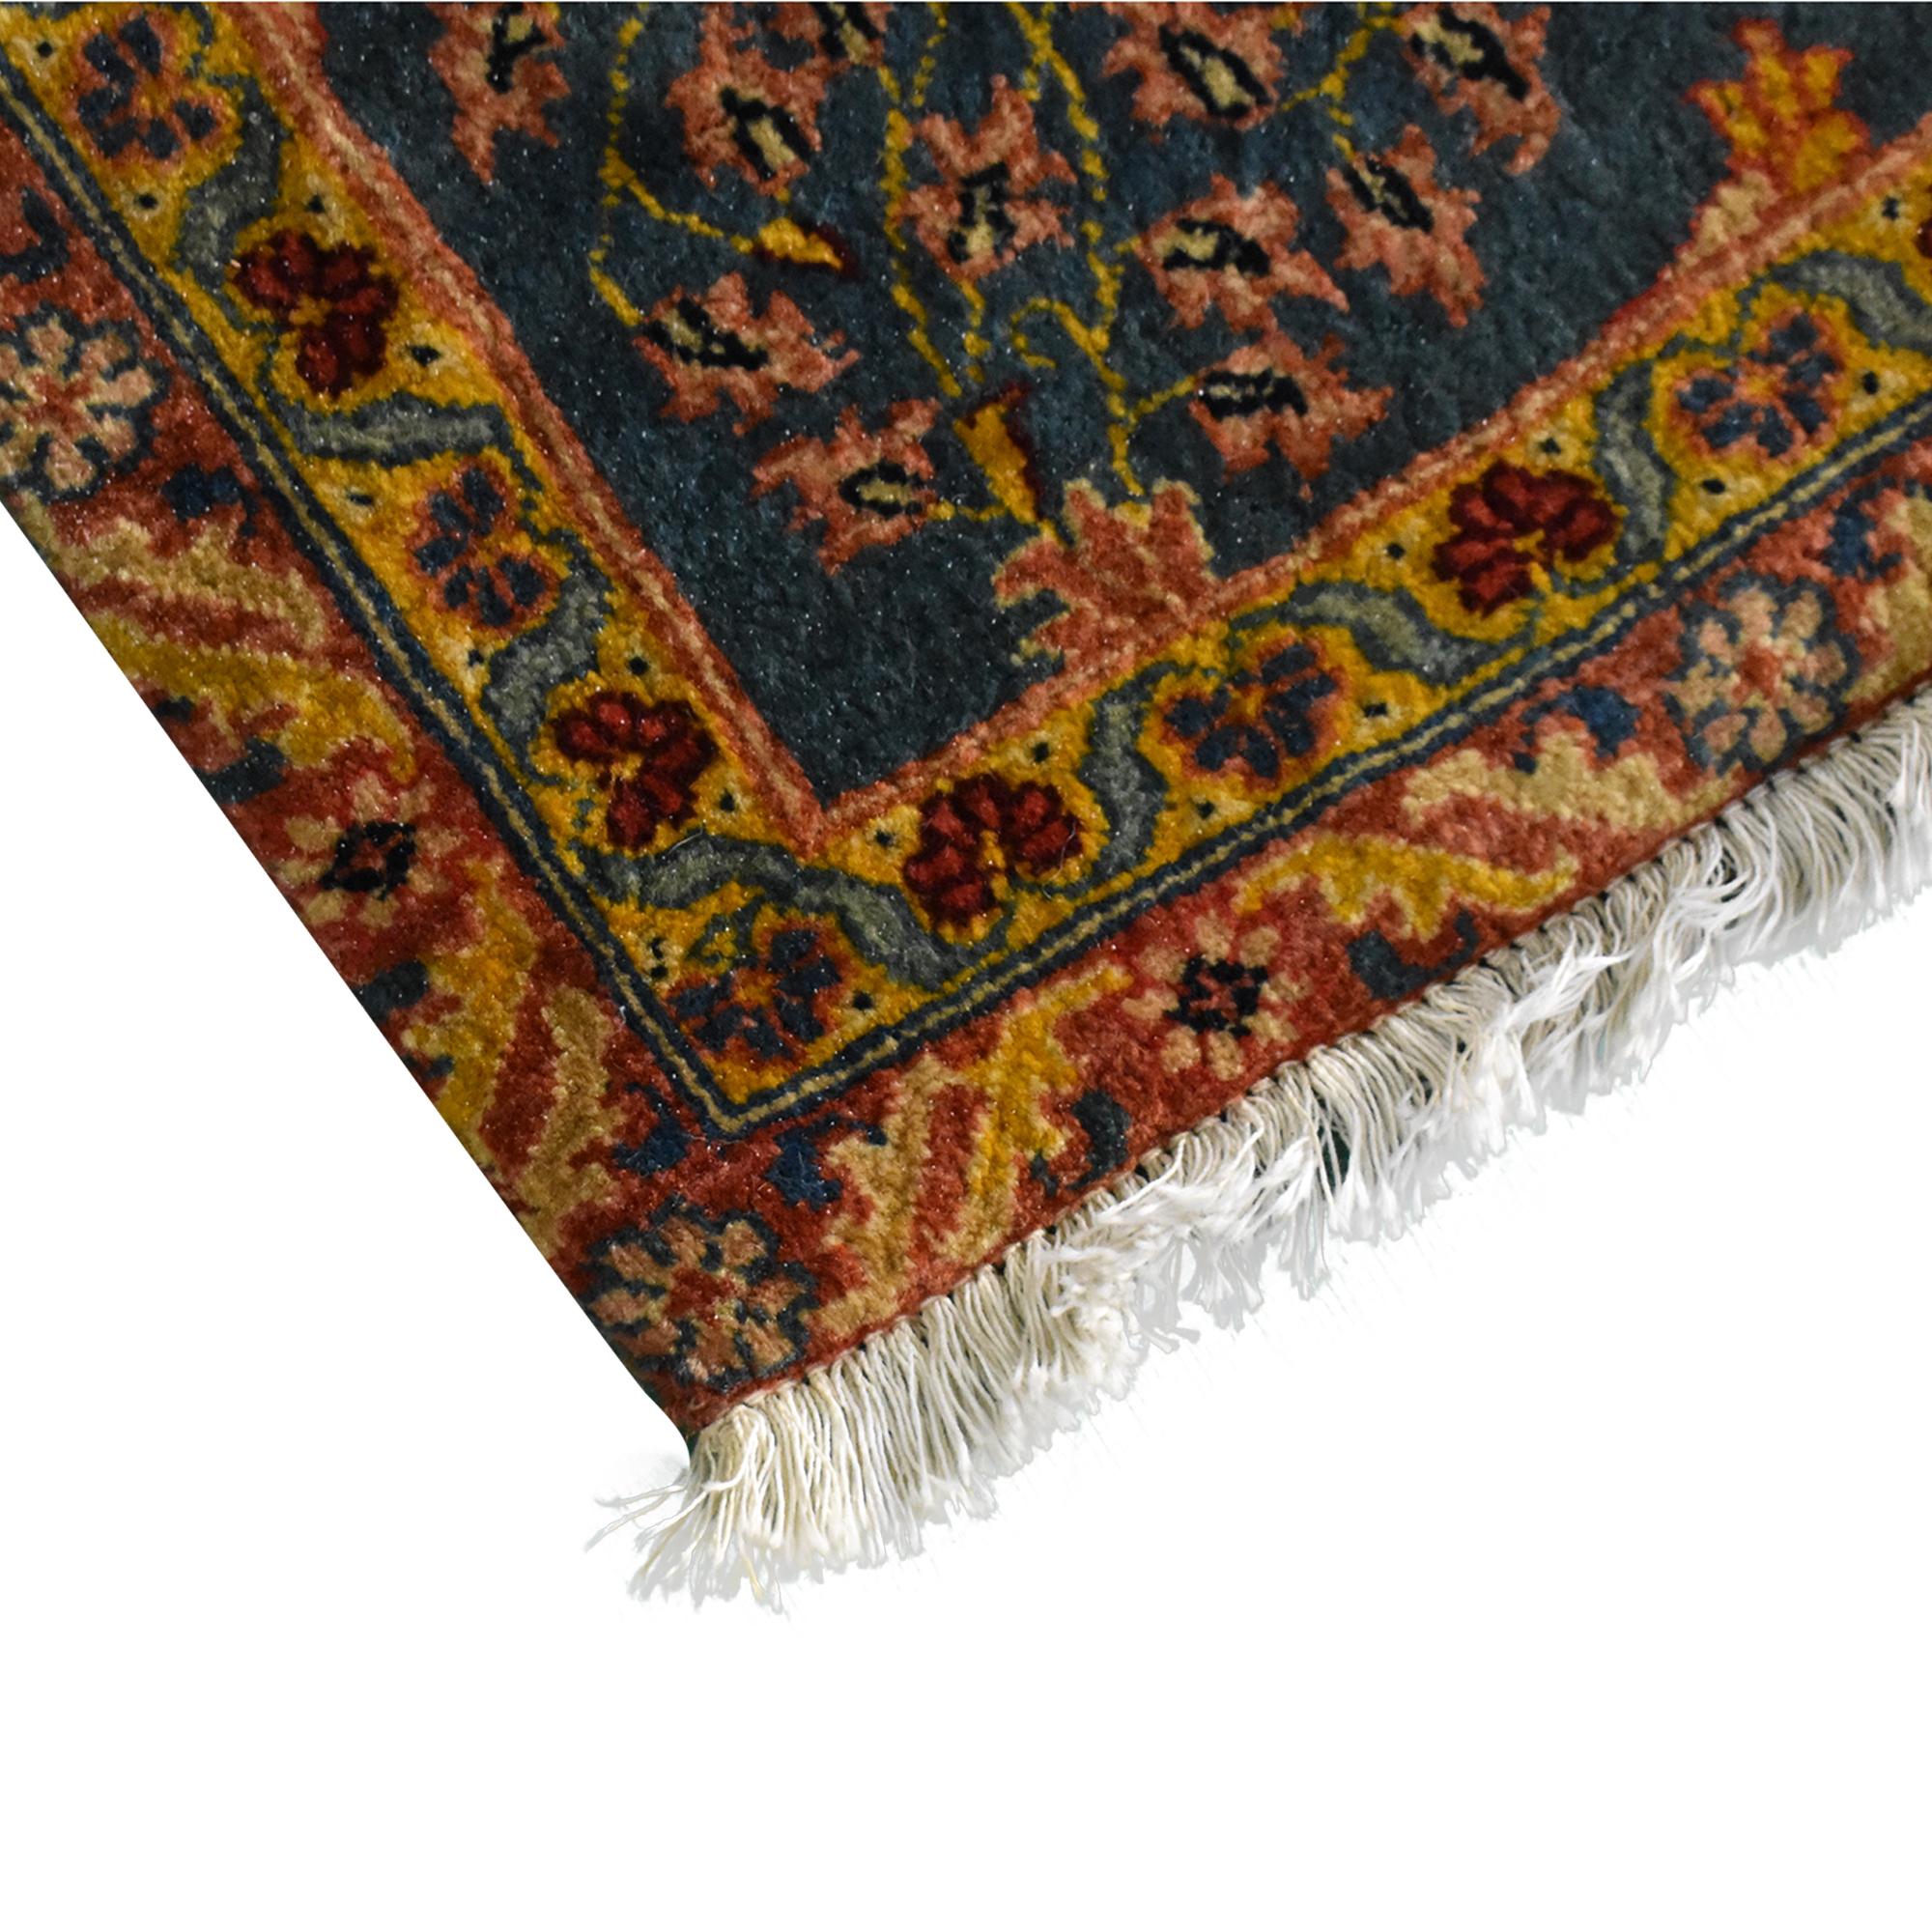 shop ABC Carpet & Home Ajmer Patterned Rug ABC Carpet & Home